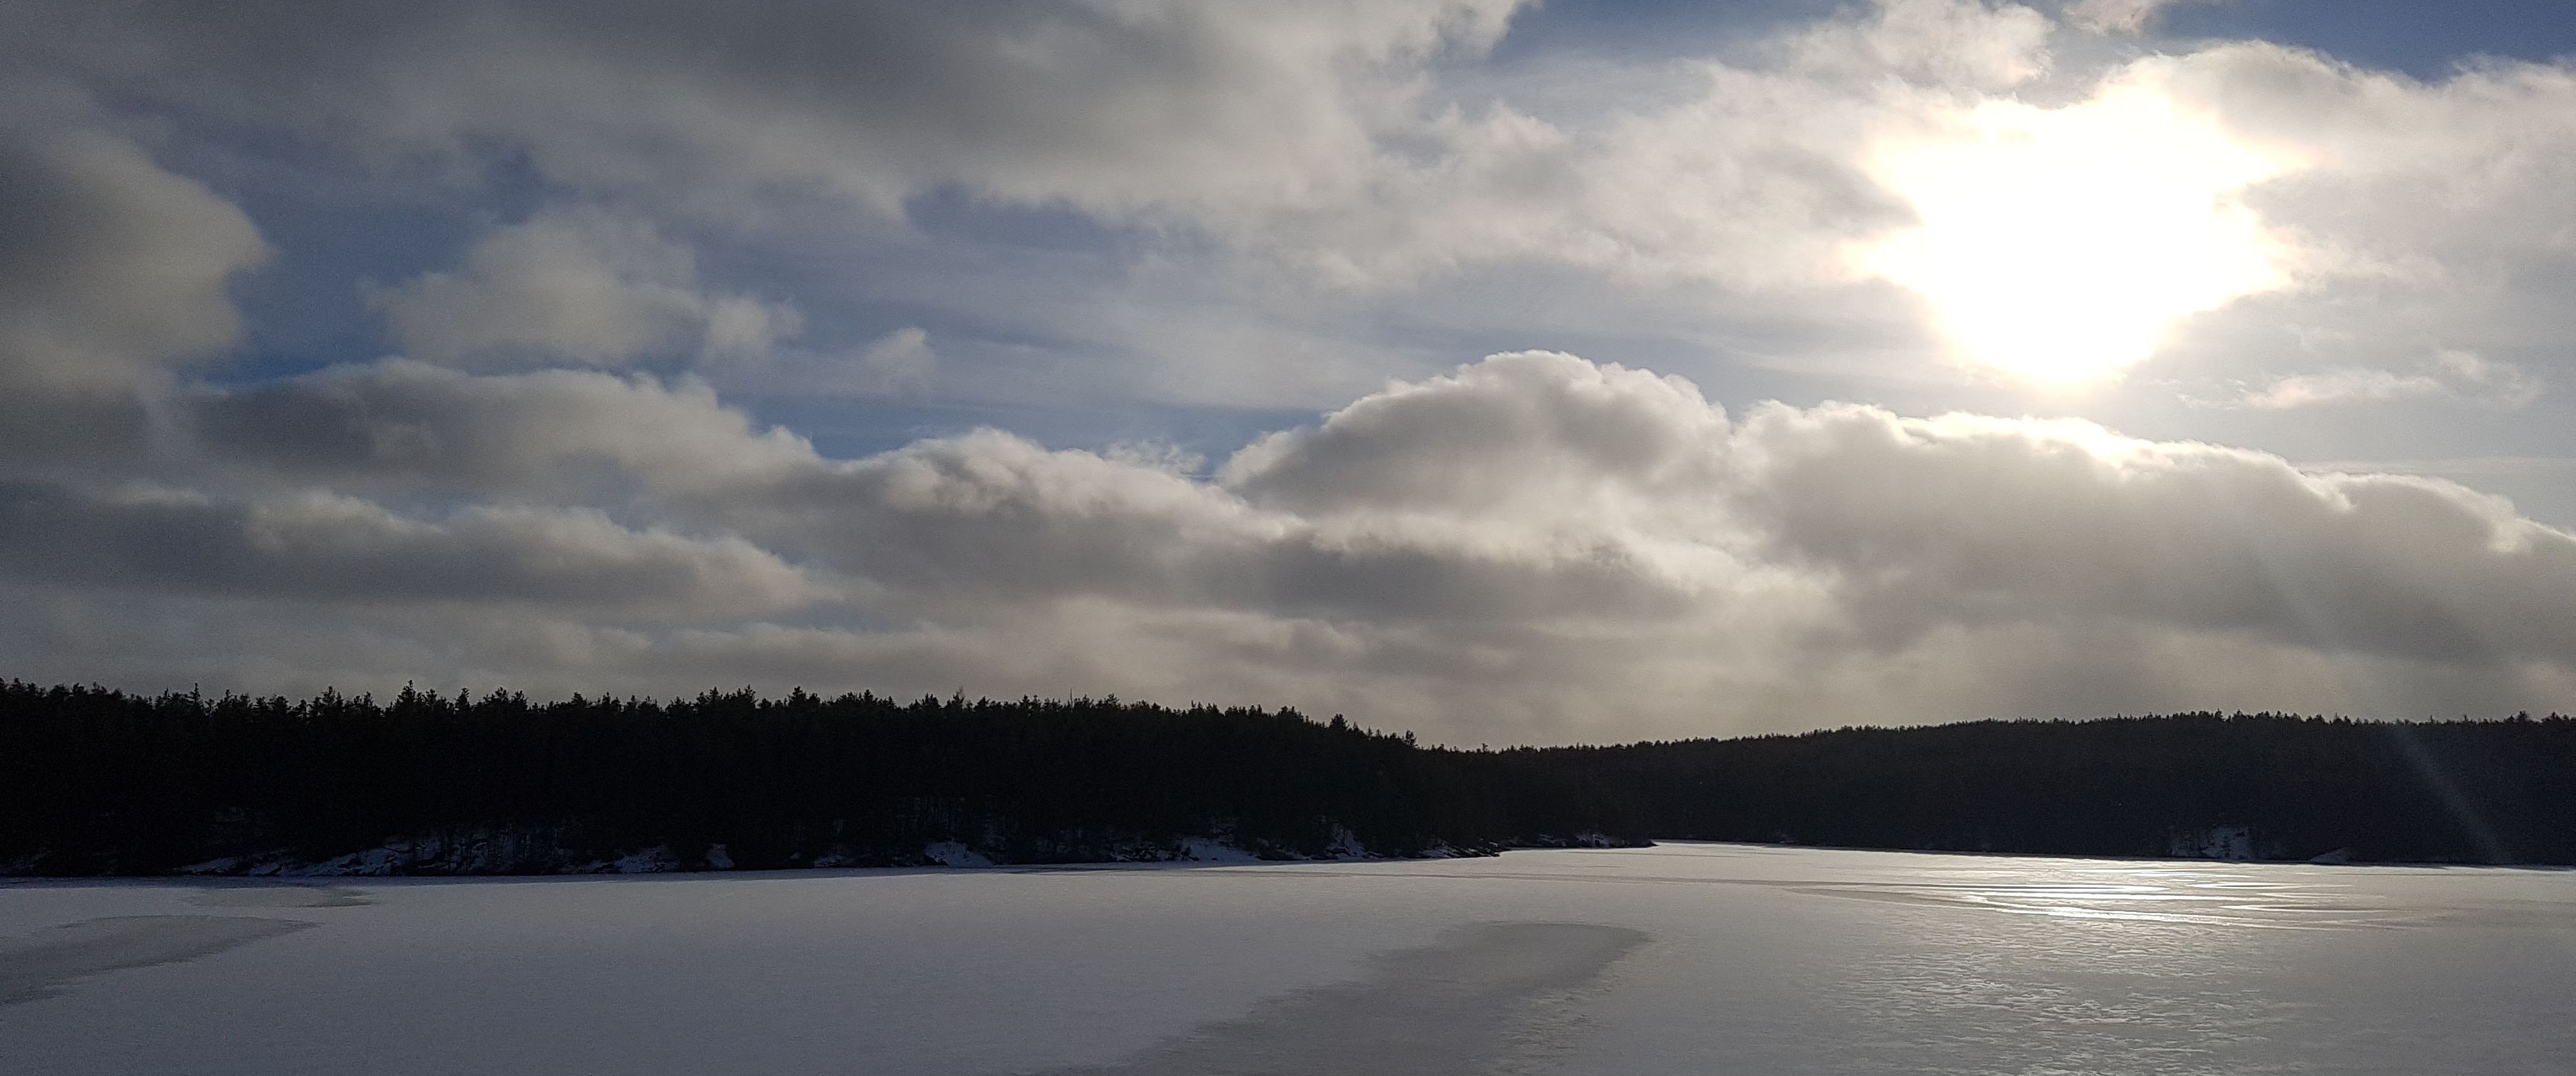 little joe lake - JCC road trip Canada